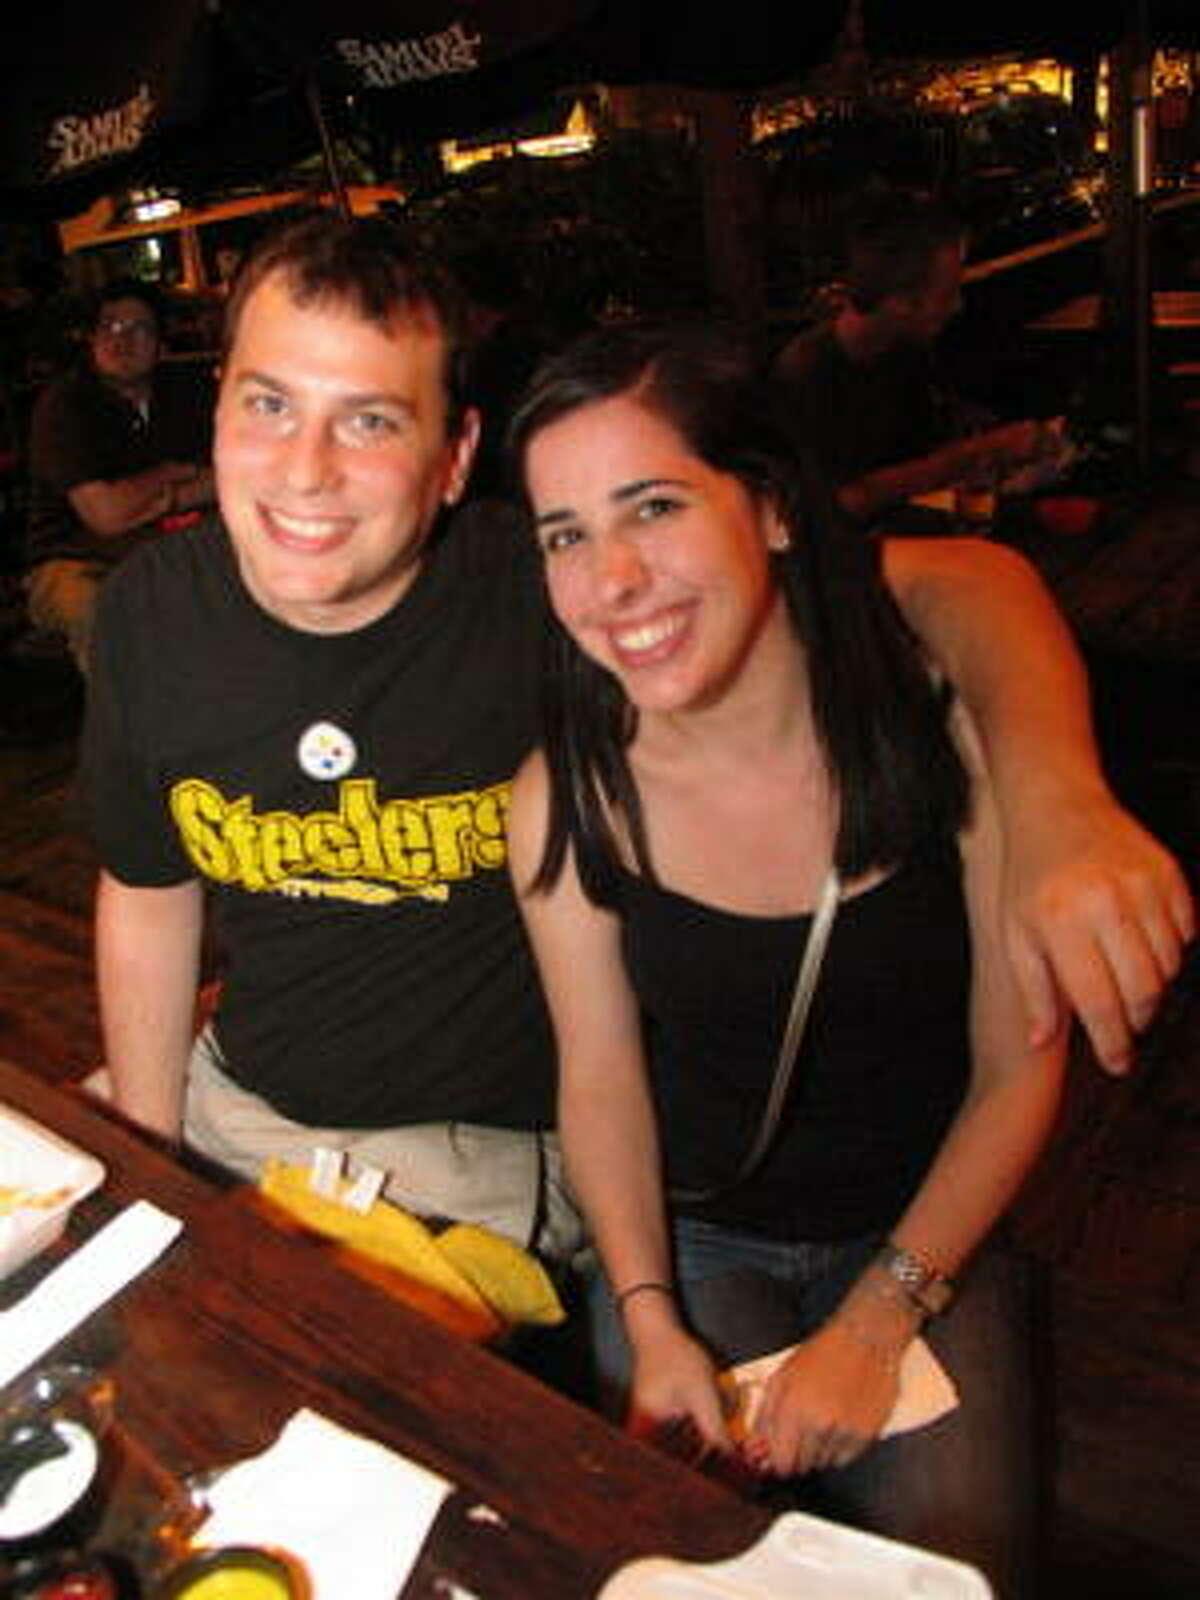 Matt Hodes, left, and Lindsey Fox